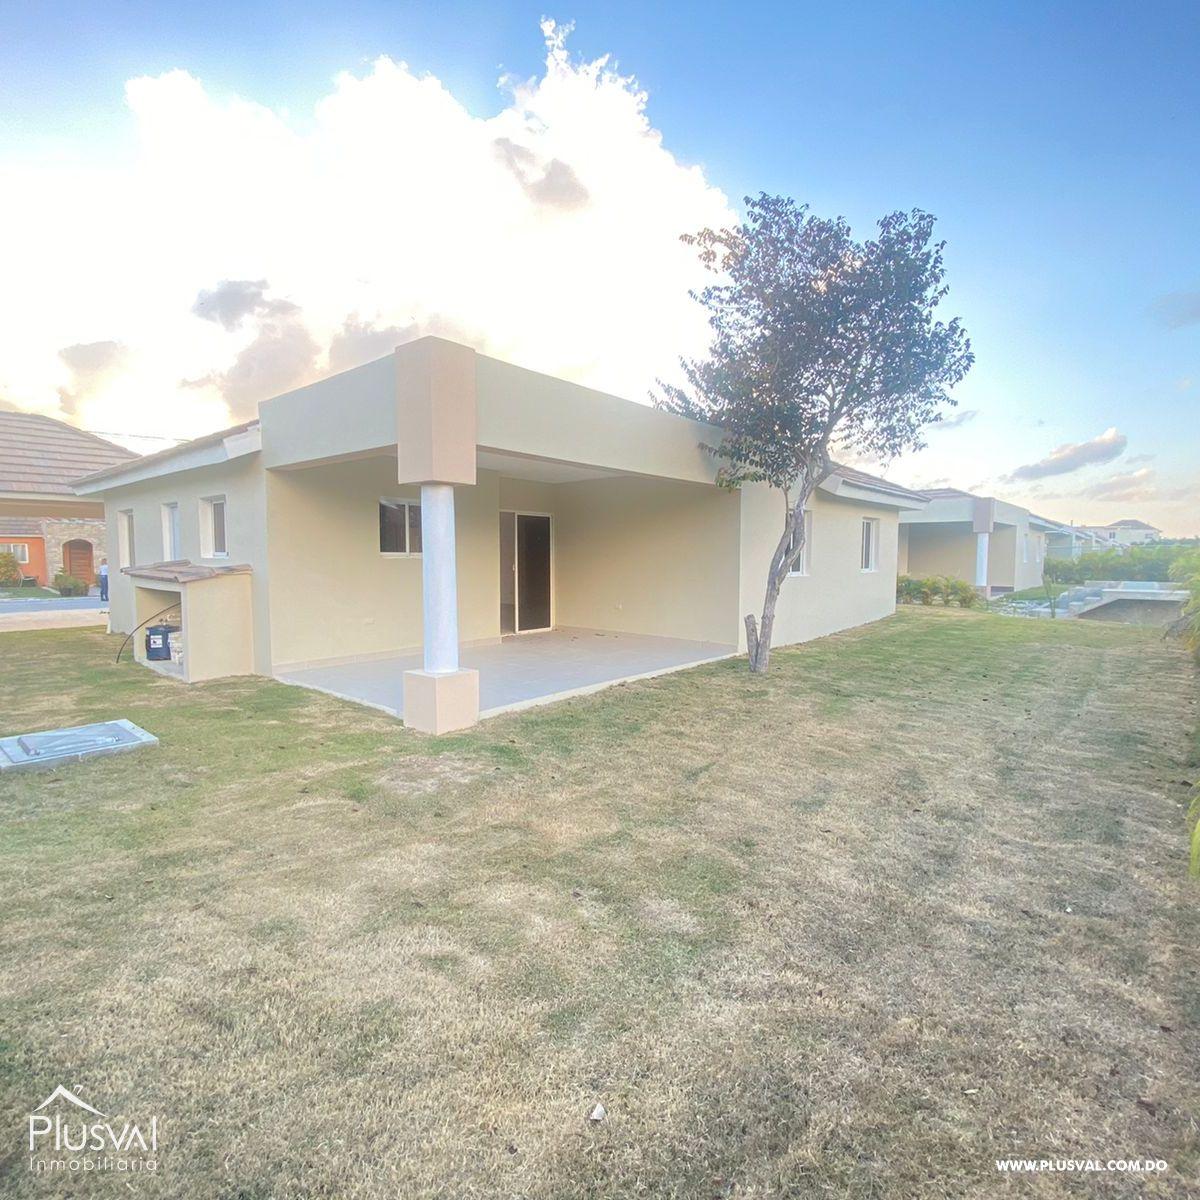 Proyecto exclusivo de casas con piscina en Punta Cana 174085